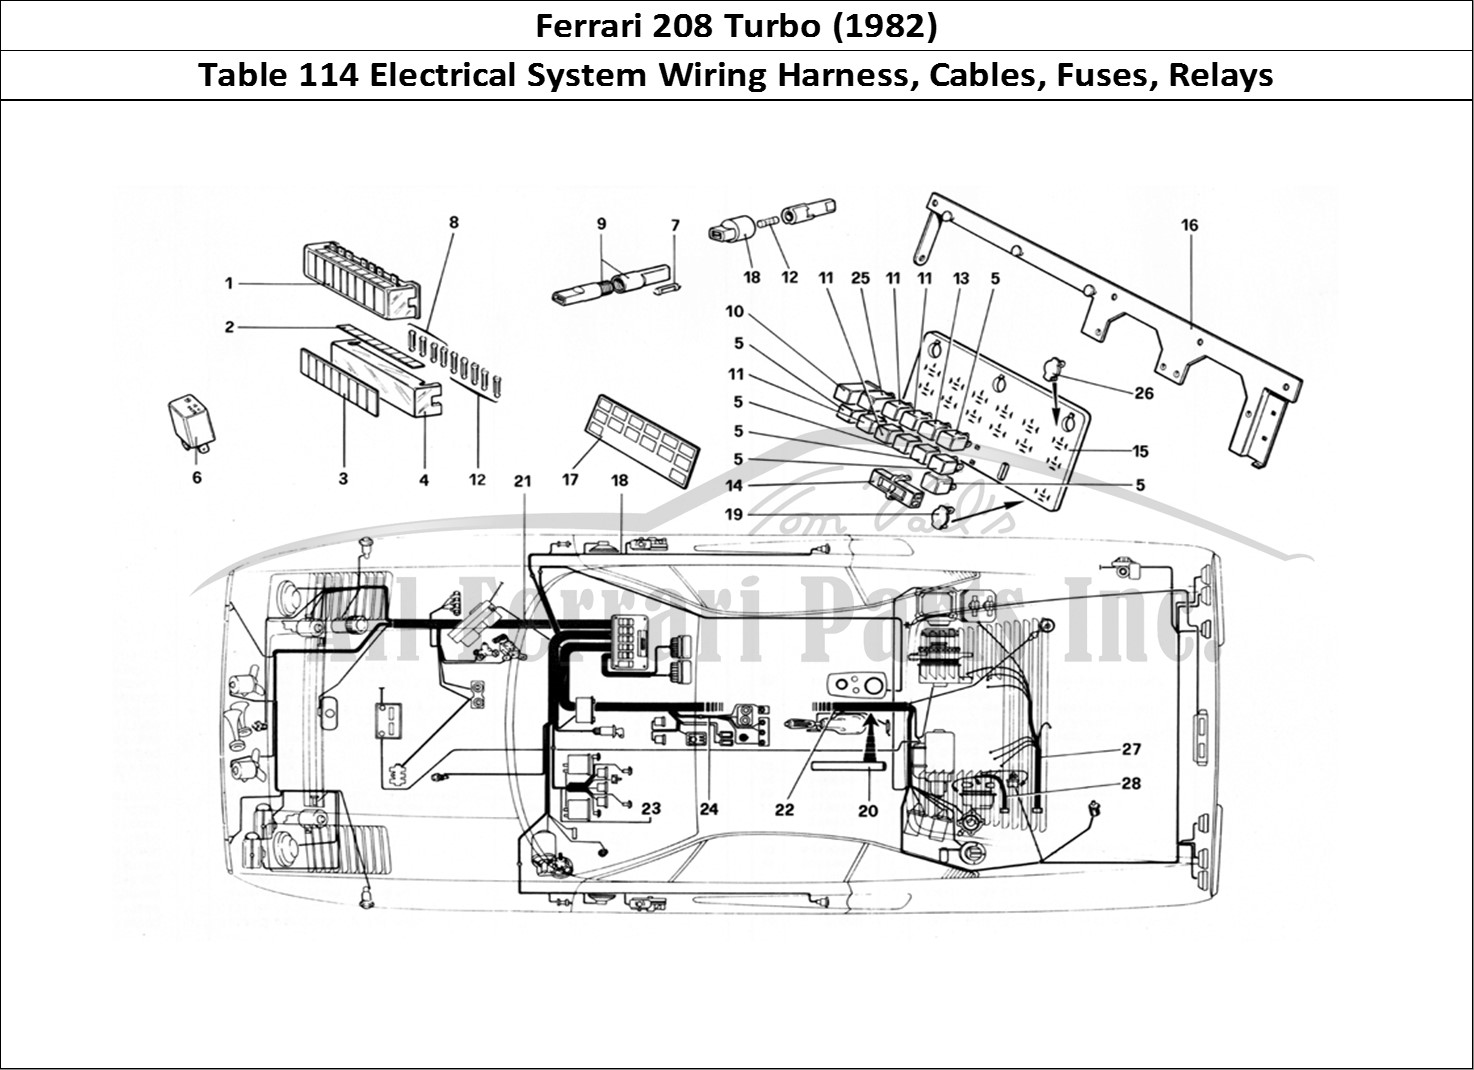 Buy original Ferrari 208 Turbo (1982) 114 Electrical